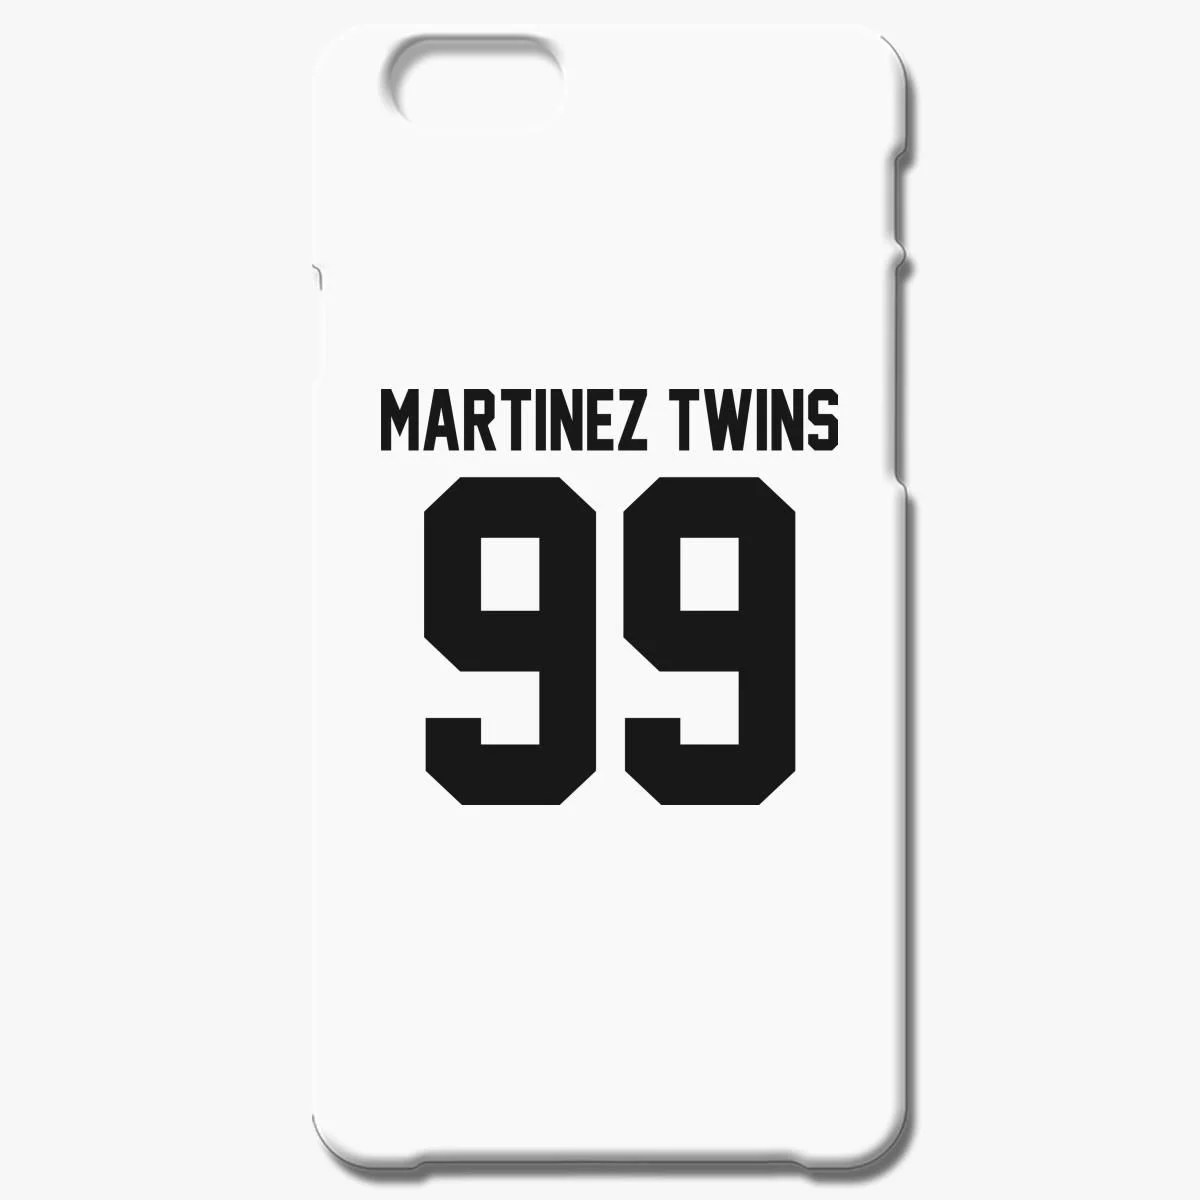 Martinez Twins Iphone 6 6s Case